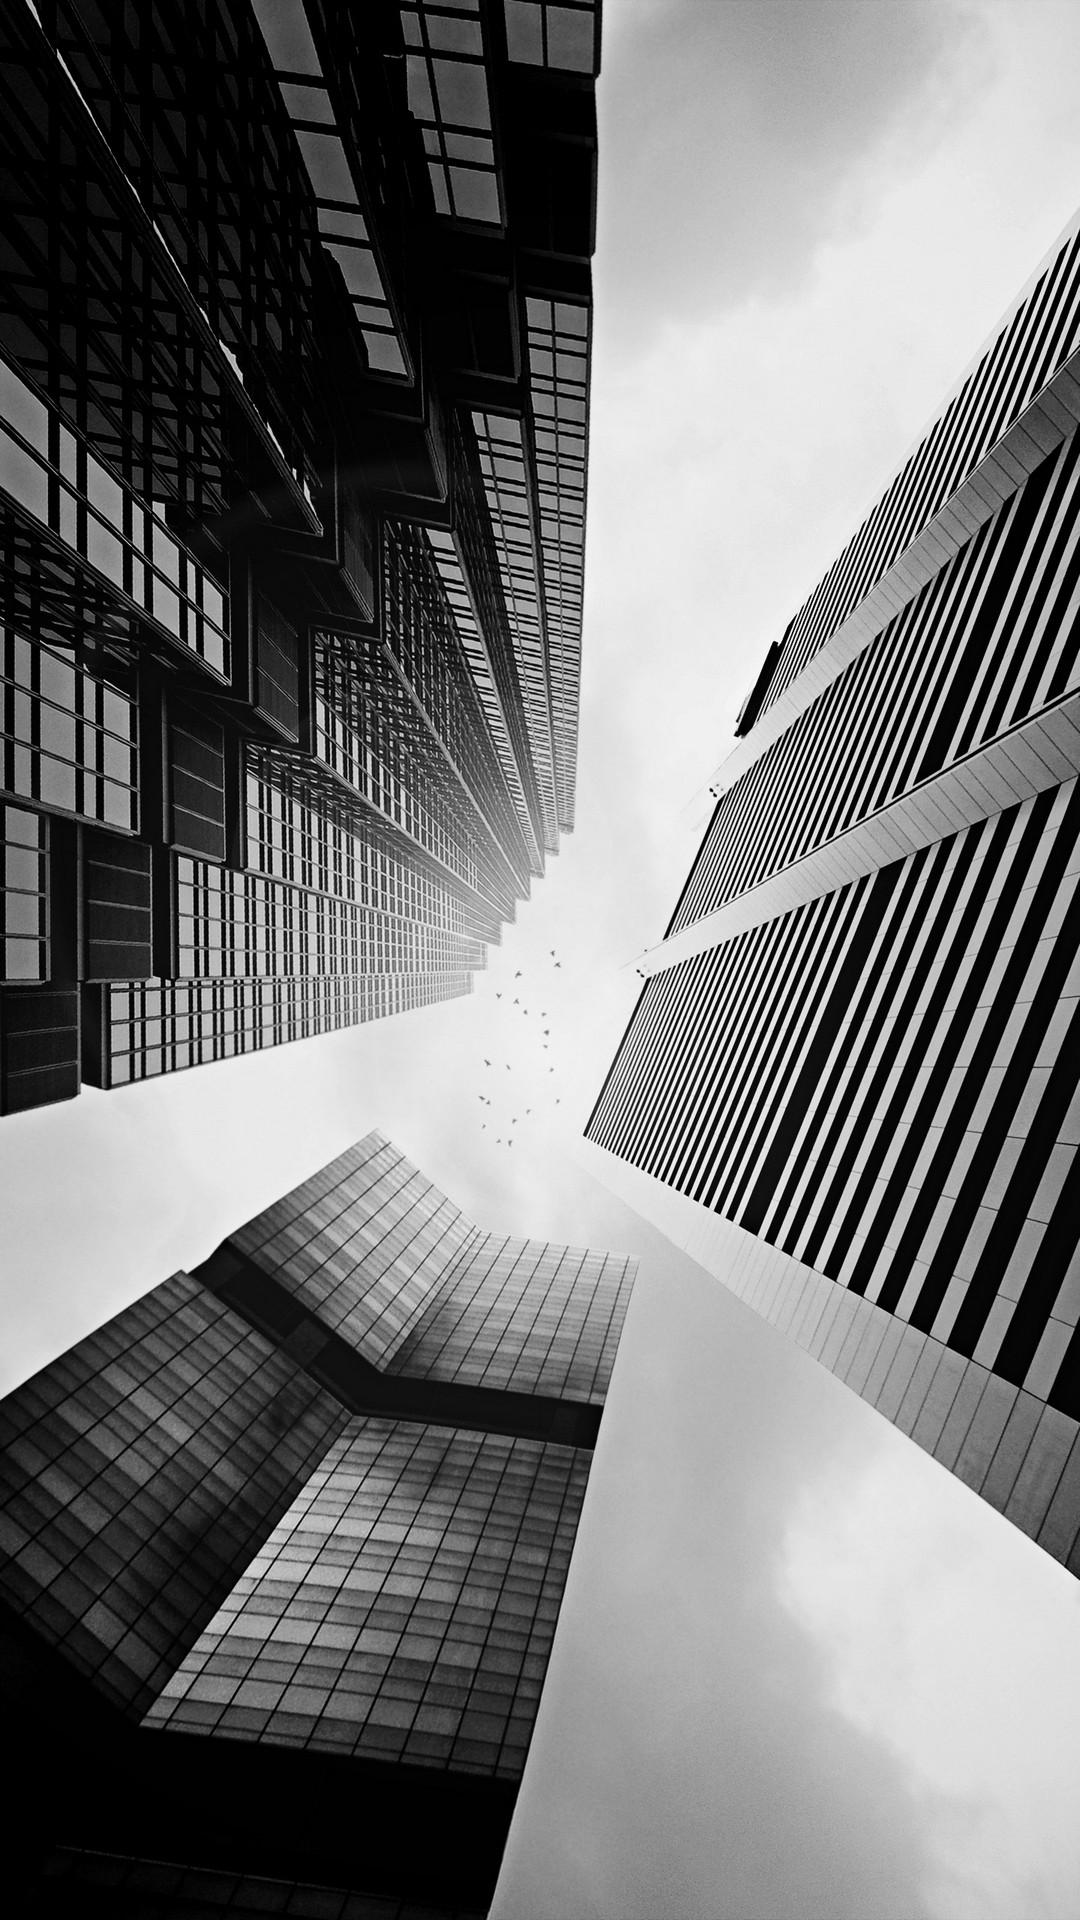 Skyscraper Buildings Black White Lockscreen iPhone 6 Plus HD Wallpaper …